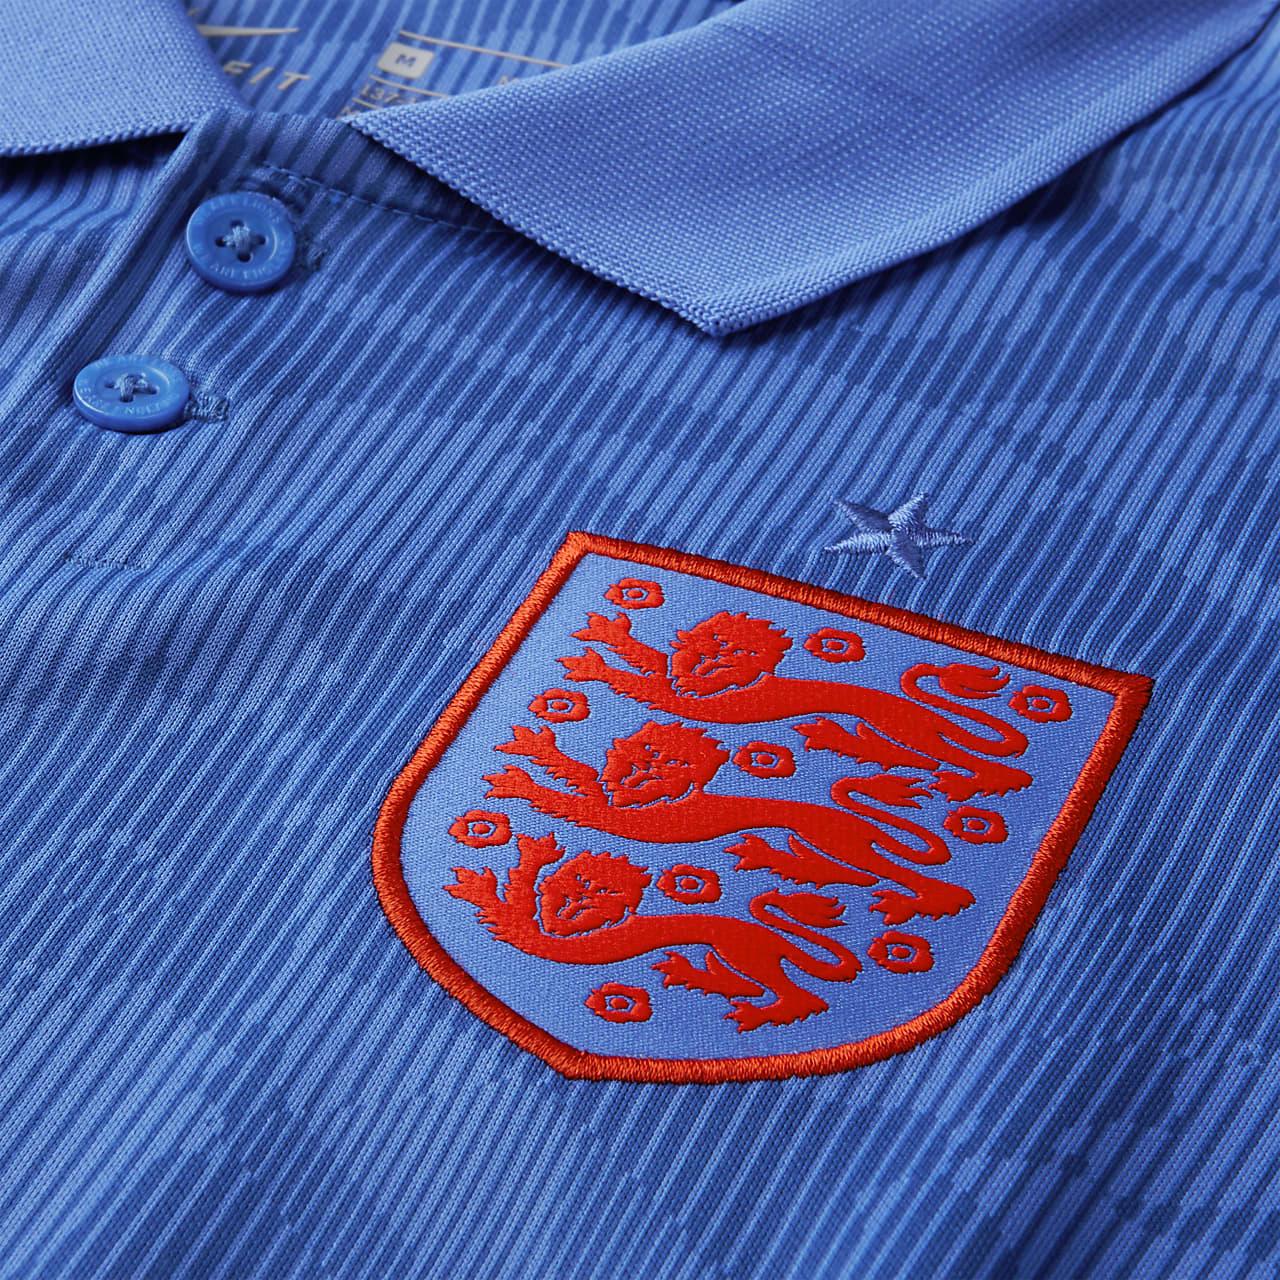 Maglia da calcio Inghilterra 2020 Stadium per ragazzi - Away